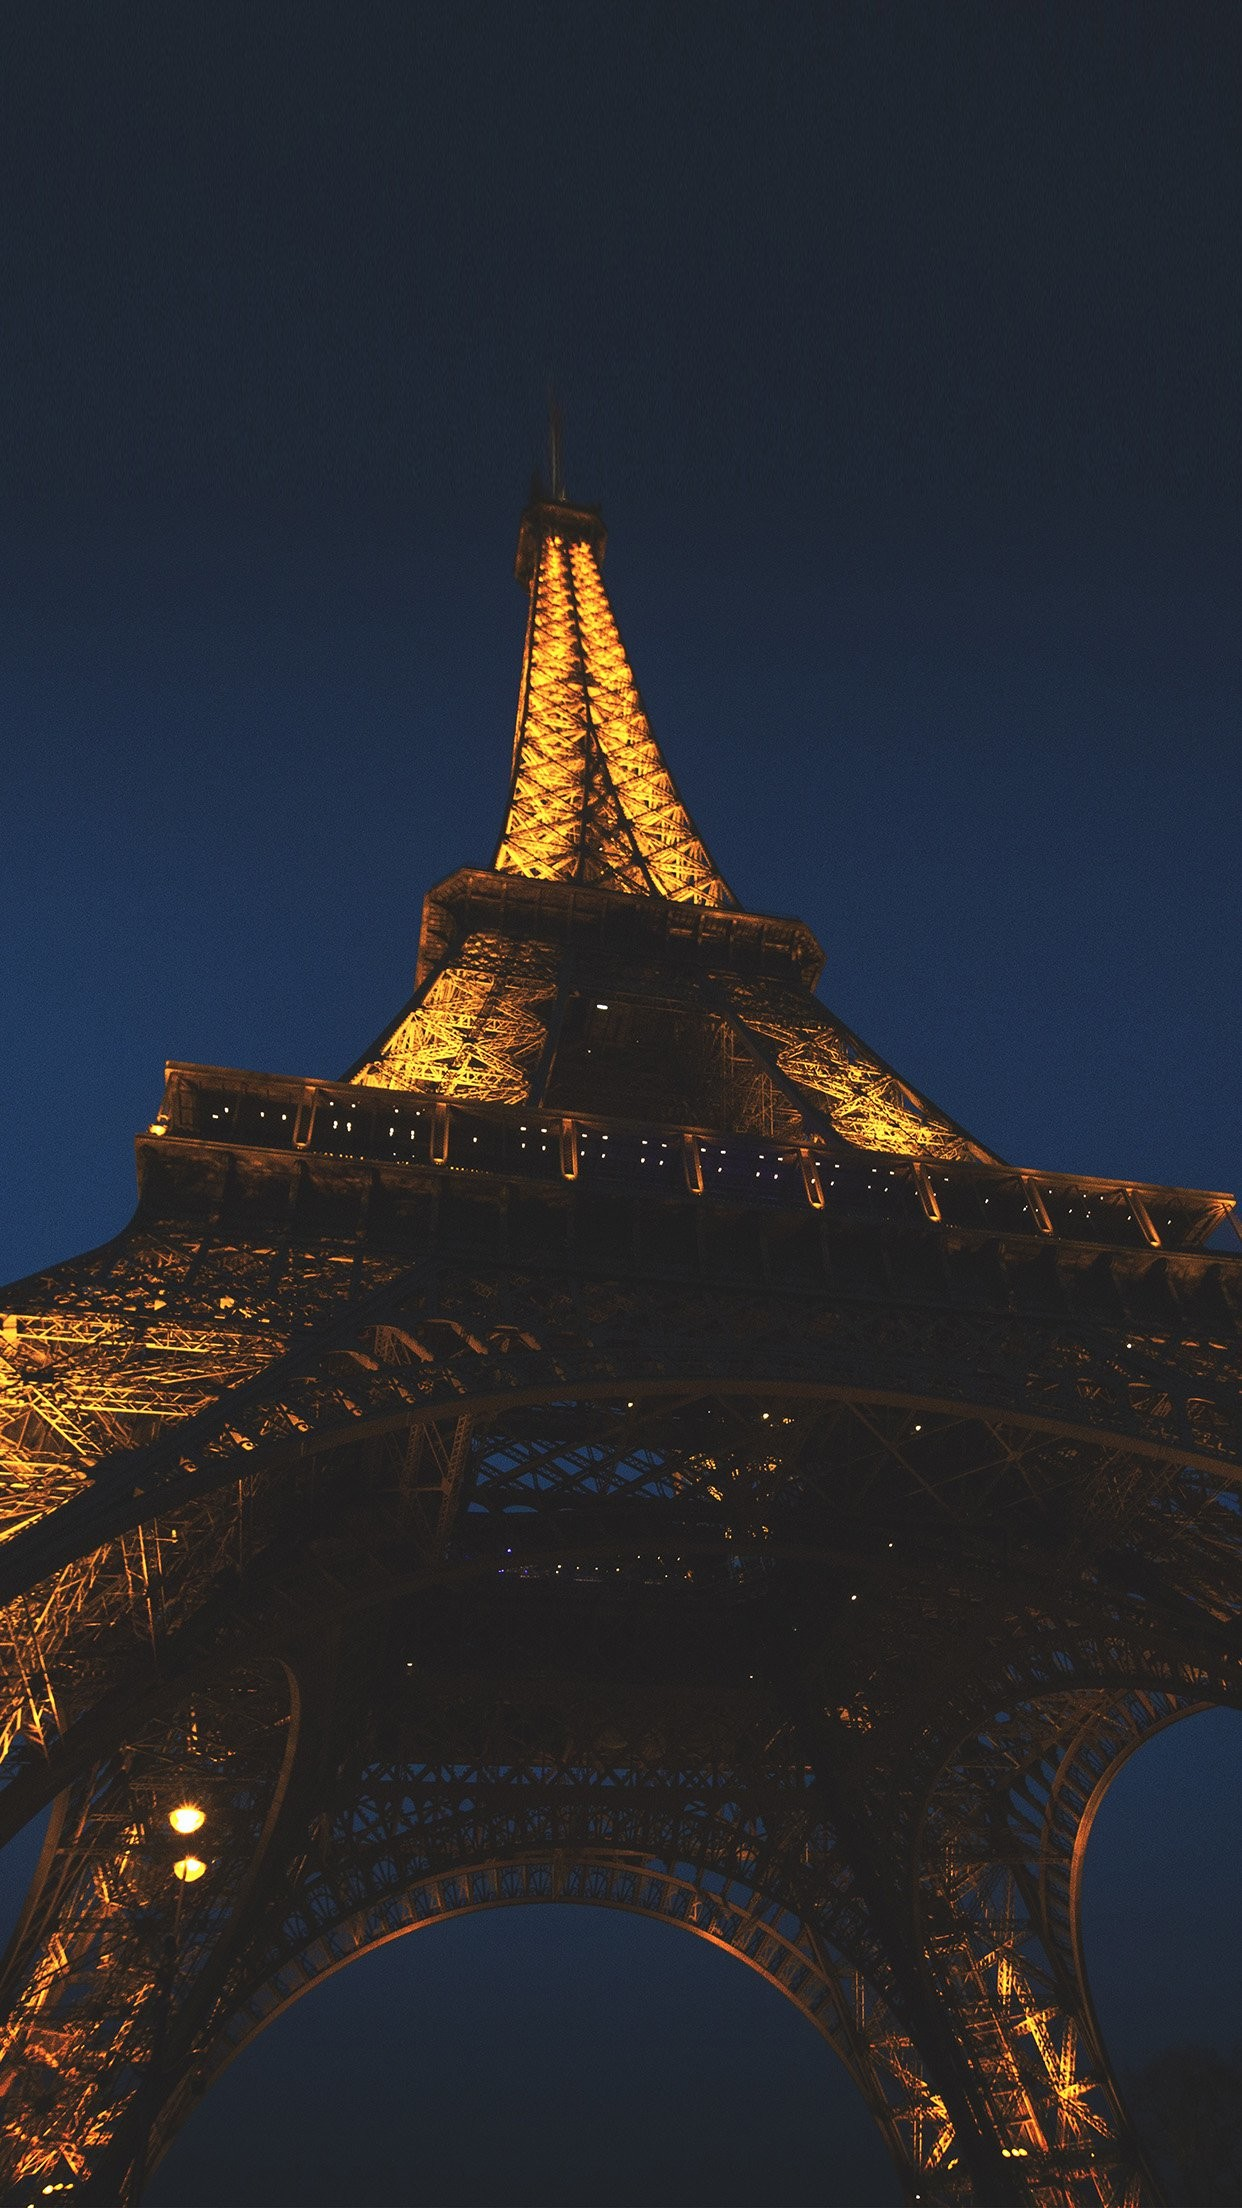 Wallpaper Of Paris France 77 Images